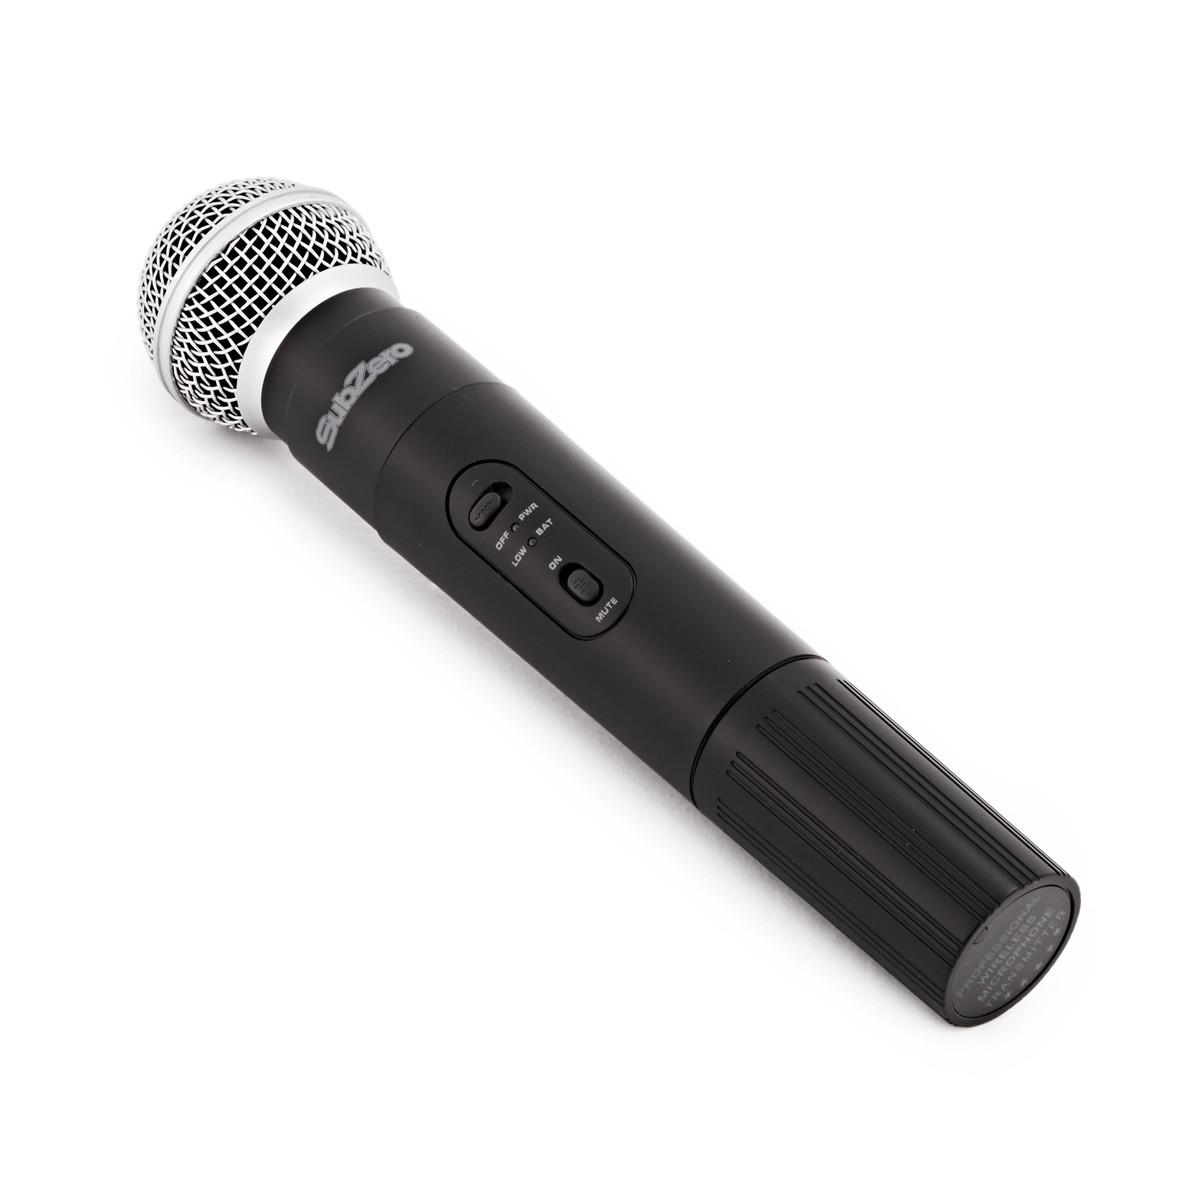 subzero szw 20 handheld wireless microphone system b stock at gear4music. Black Bedroom Furniture Sets. Home Design Ideas